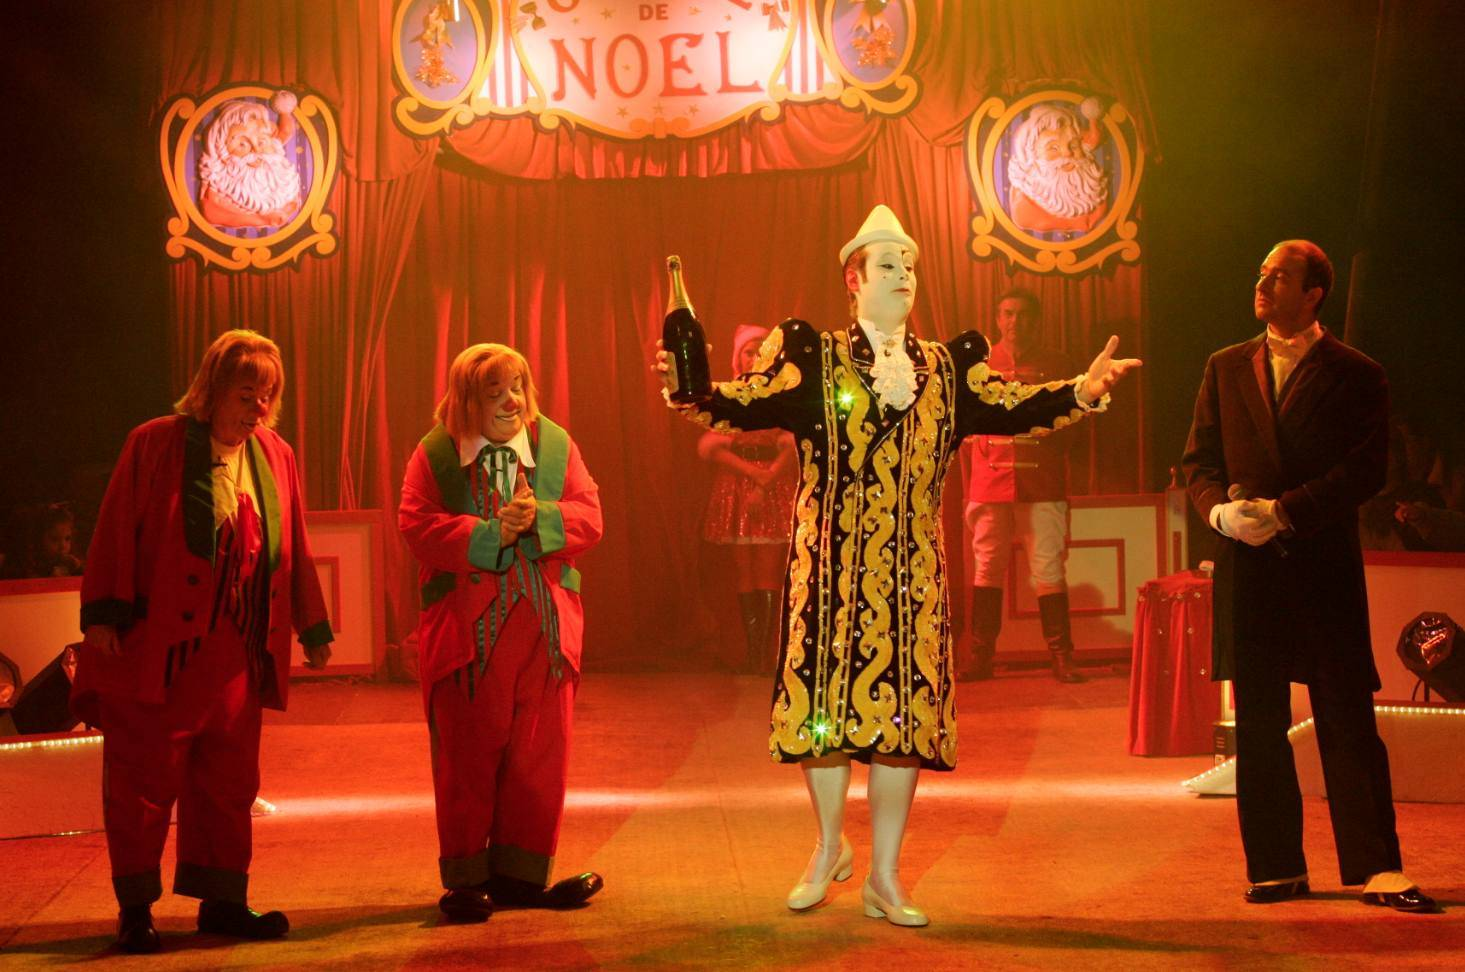 Cirque de Noël Christiane Bouglione (sachets)